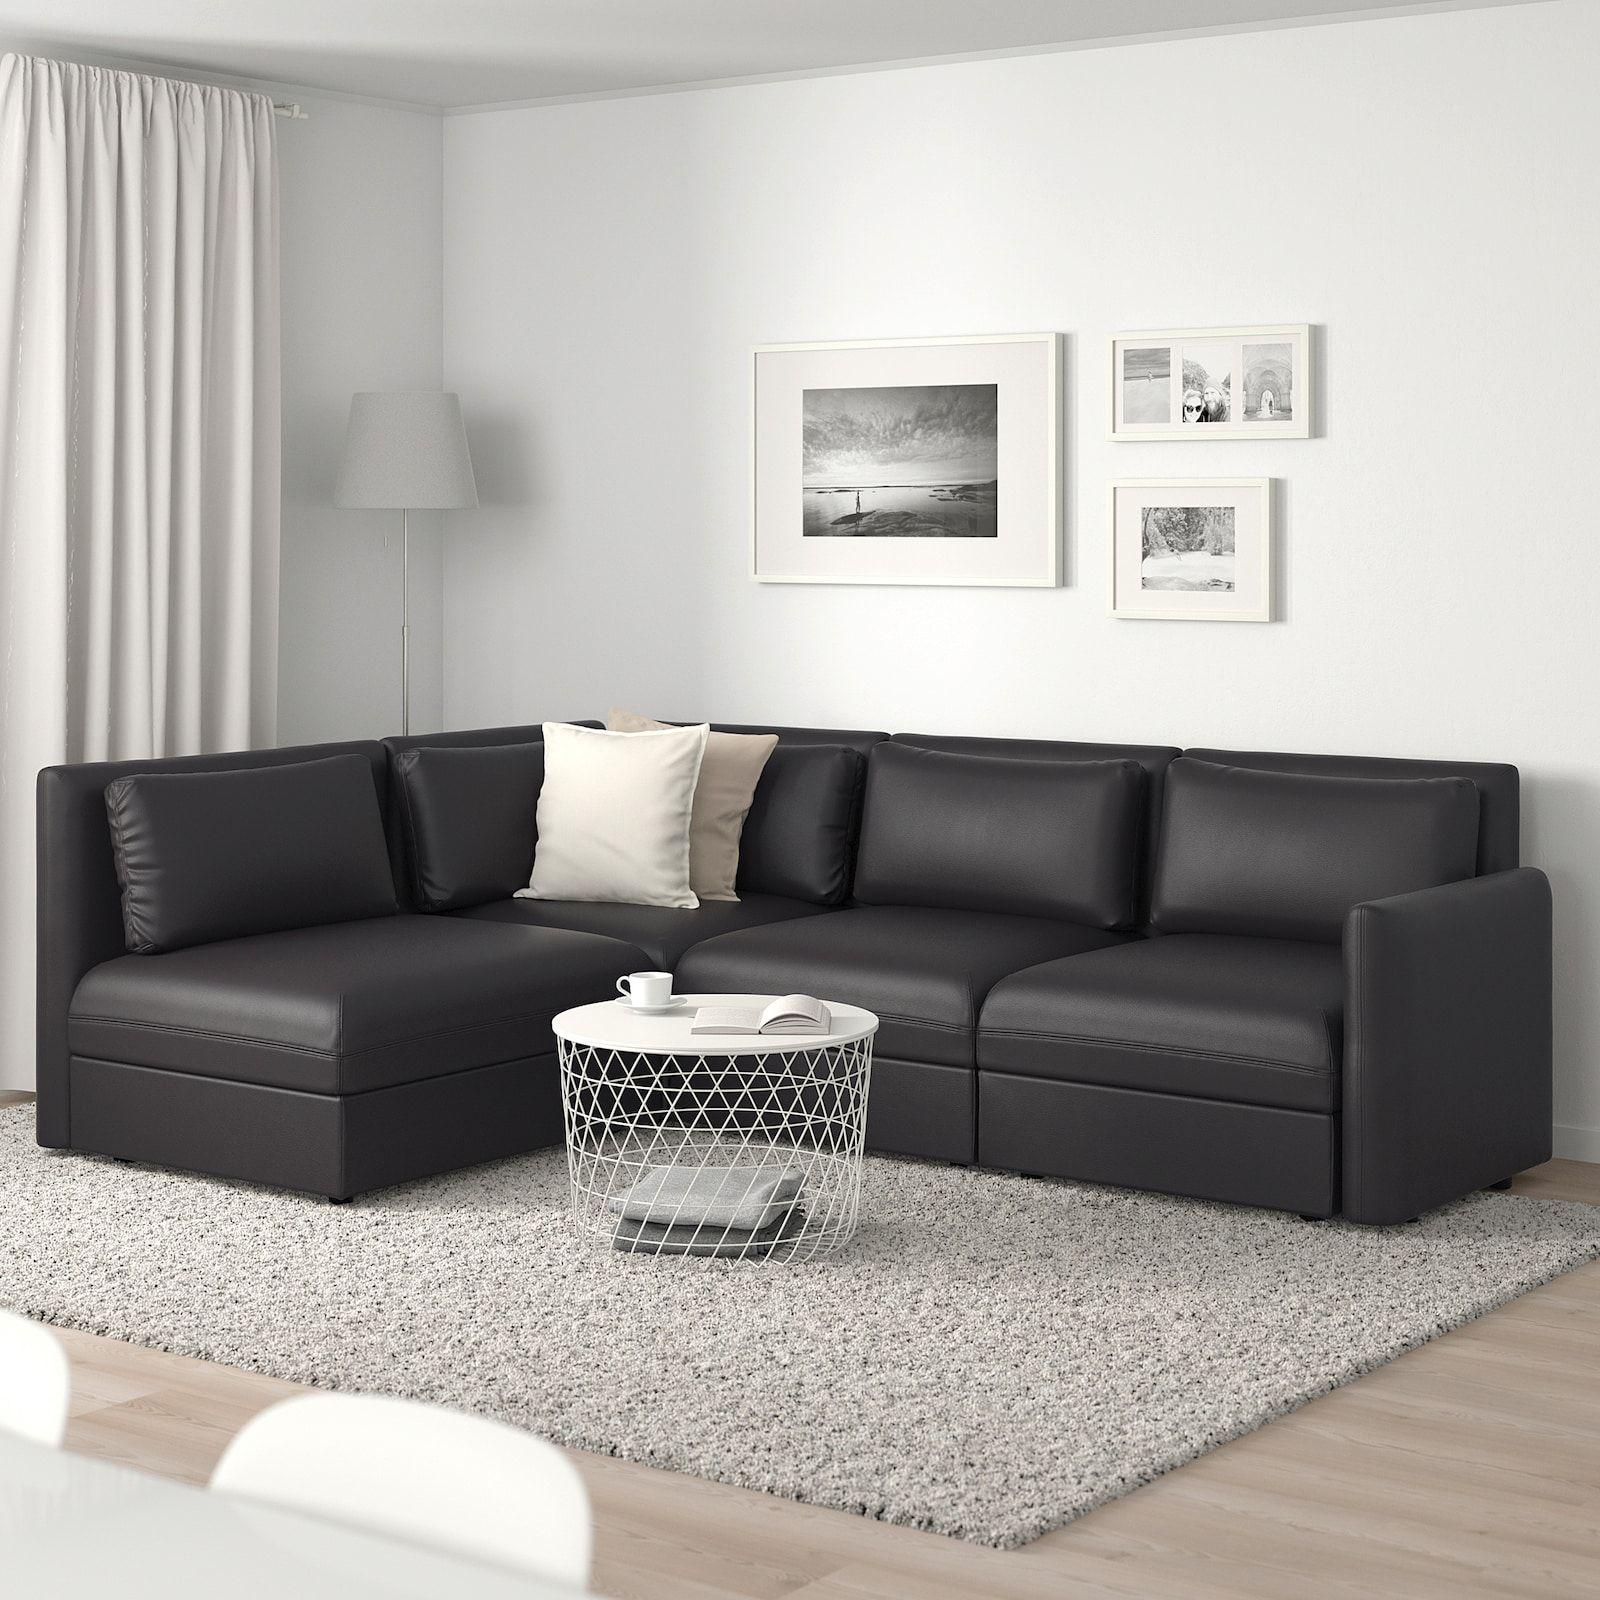 VALLENTUNA Modular corner sofa, 3seat, with storage/Black